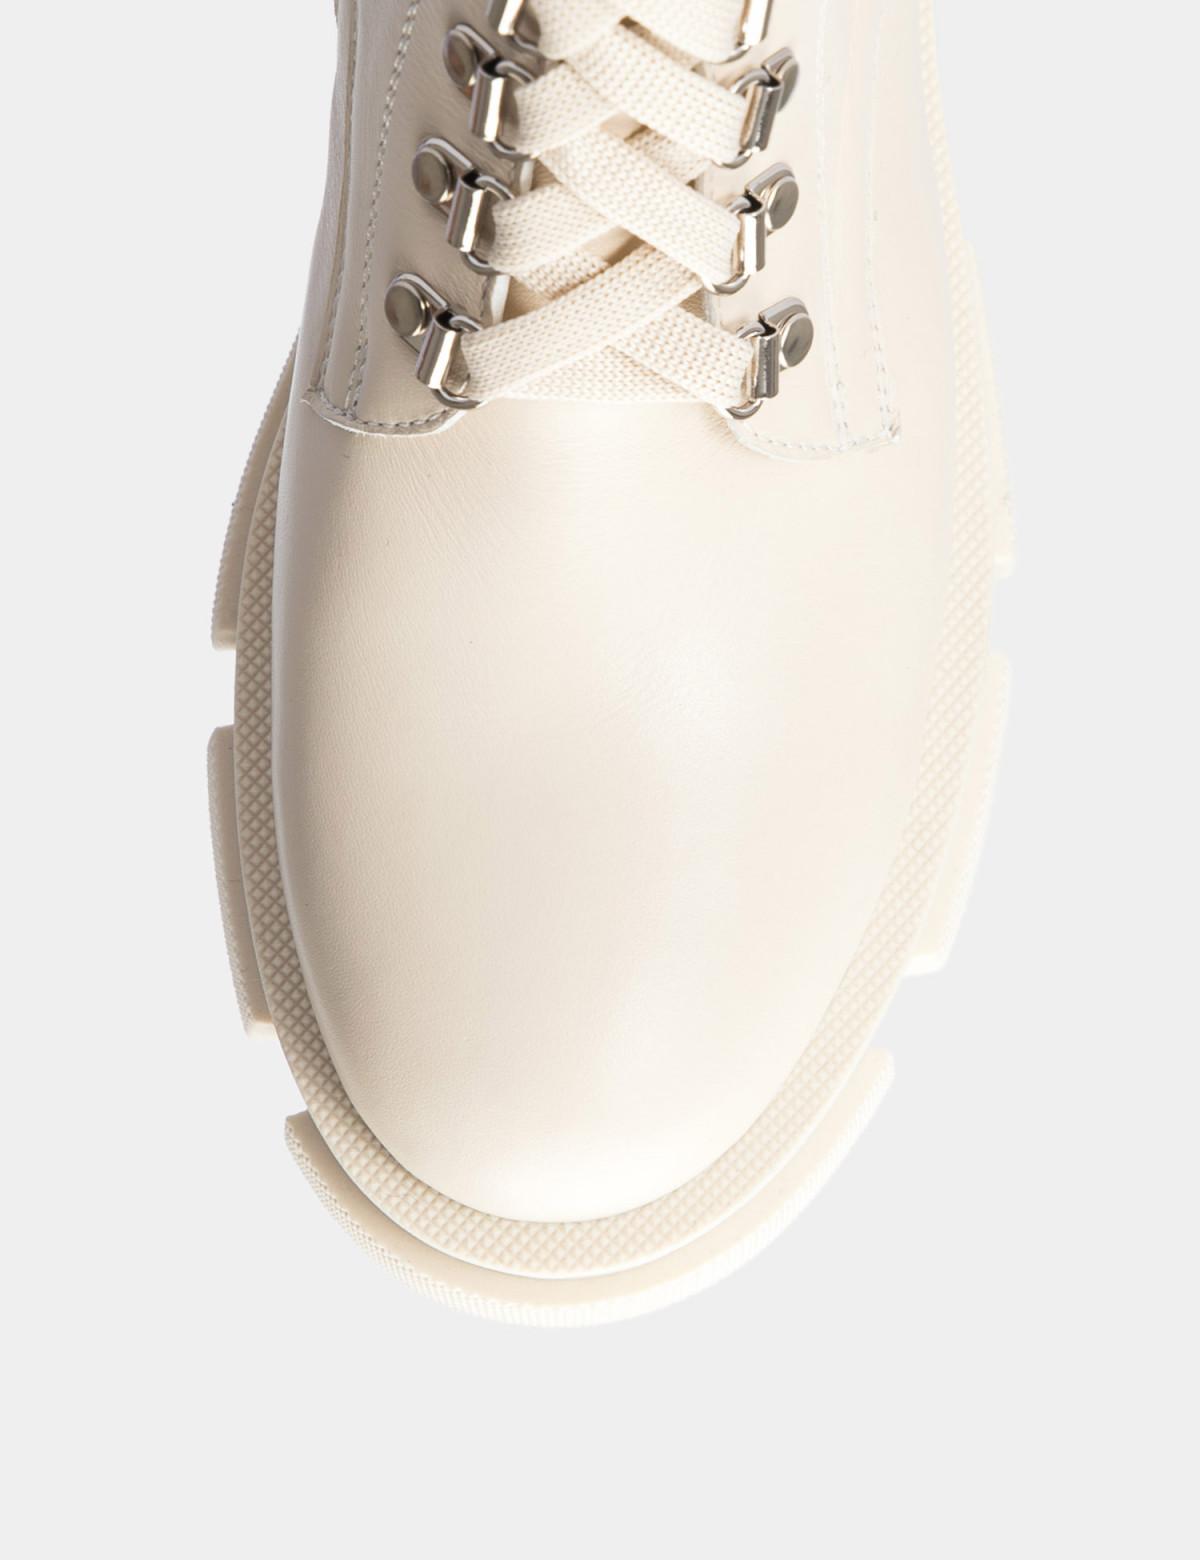 Ботинки бежевые. Натуральная кожа. Байка3